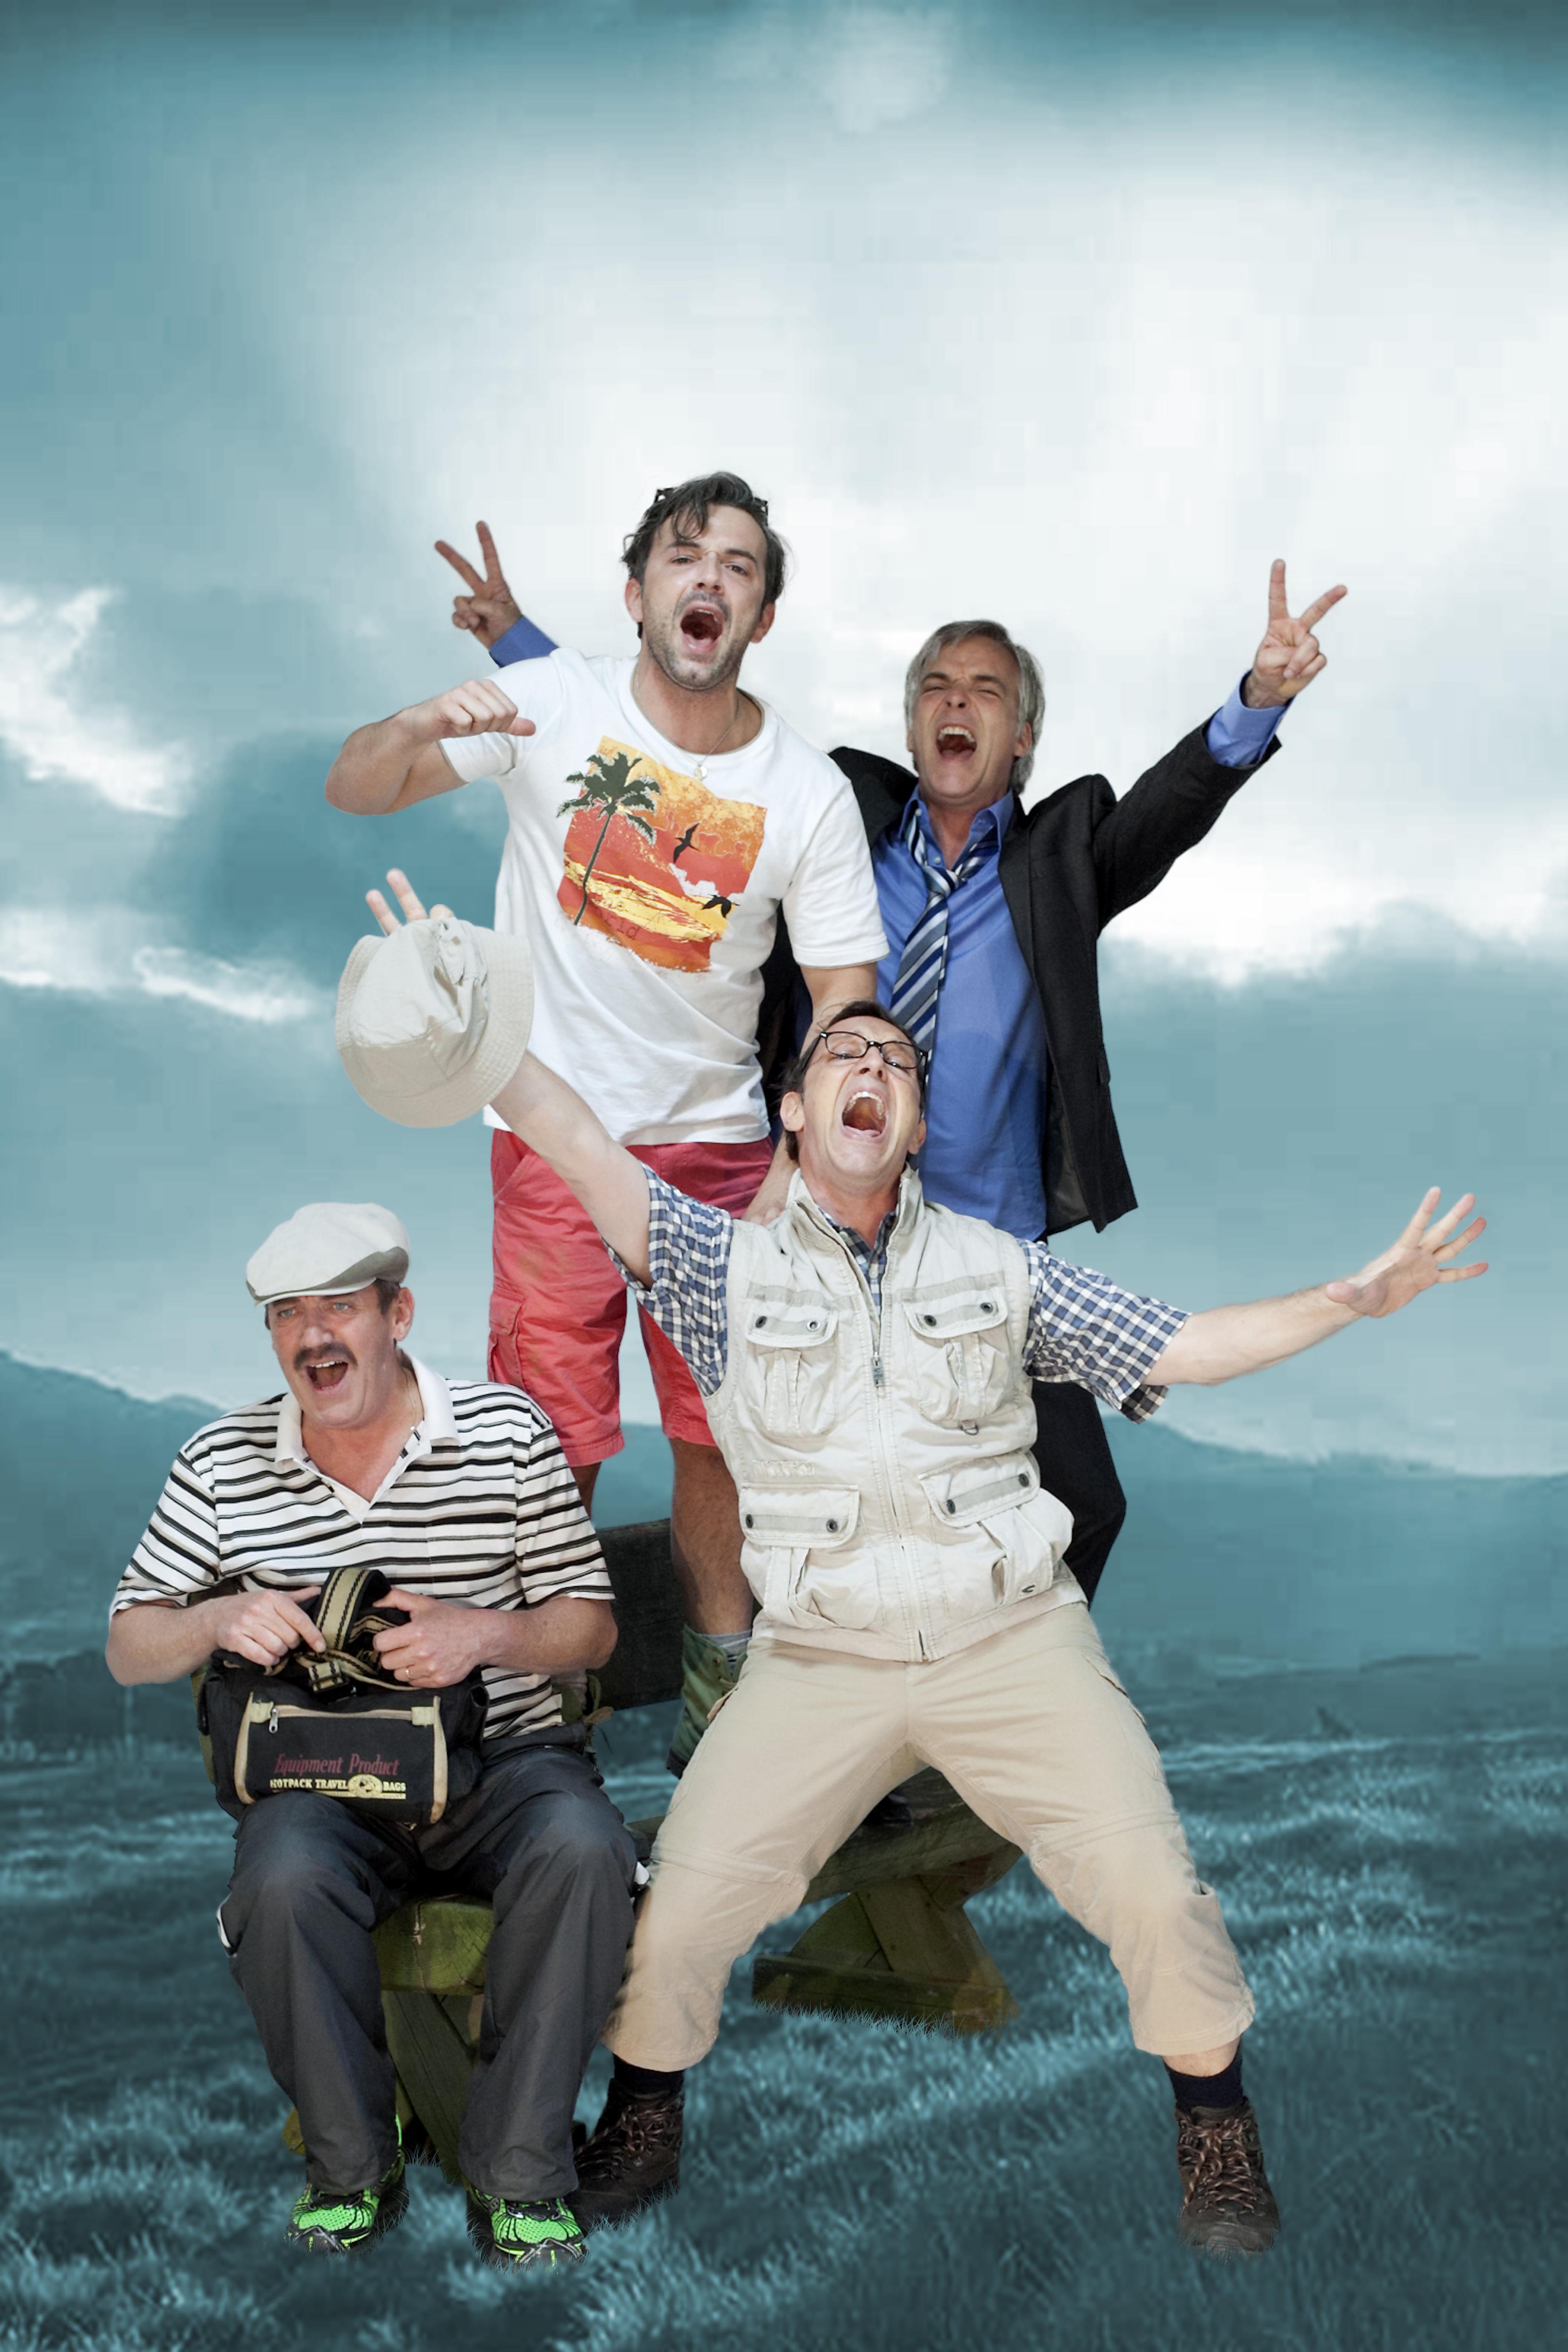 Mann o Mann - Die Midlife-Crisis-Revue - v.l.n.r.: Stefan Gossler, Alexander Wipprecht, Max Gertsch, Stephan Schill -© David Baltzer